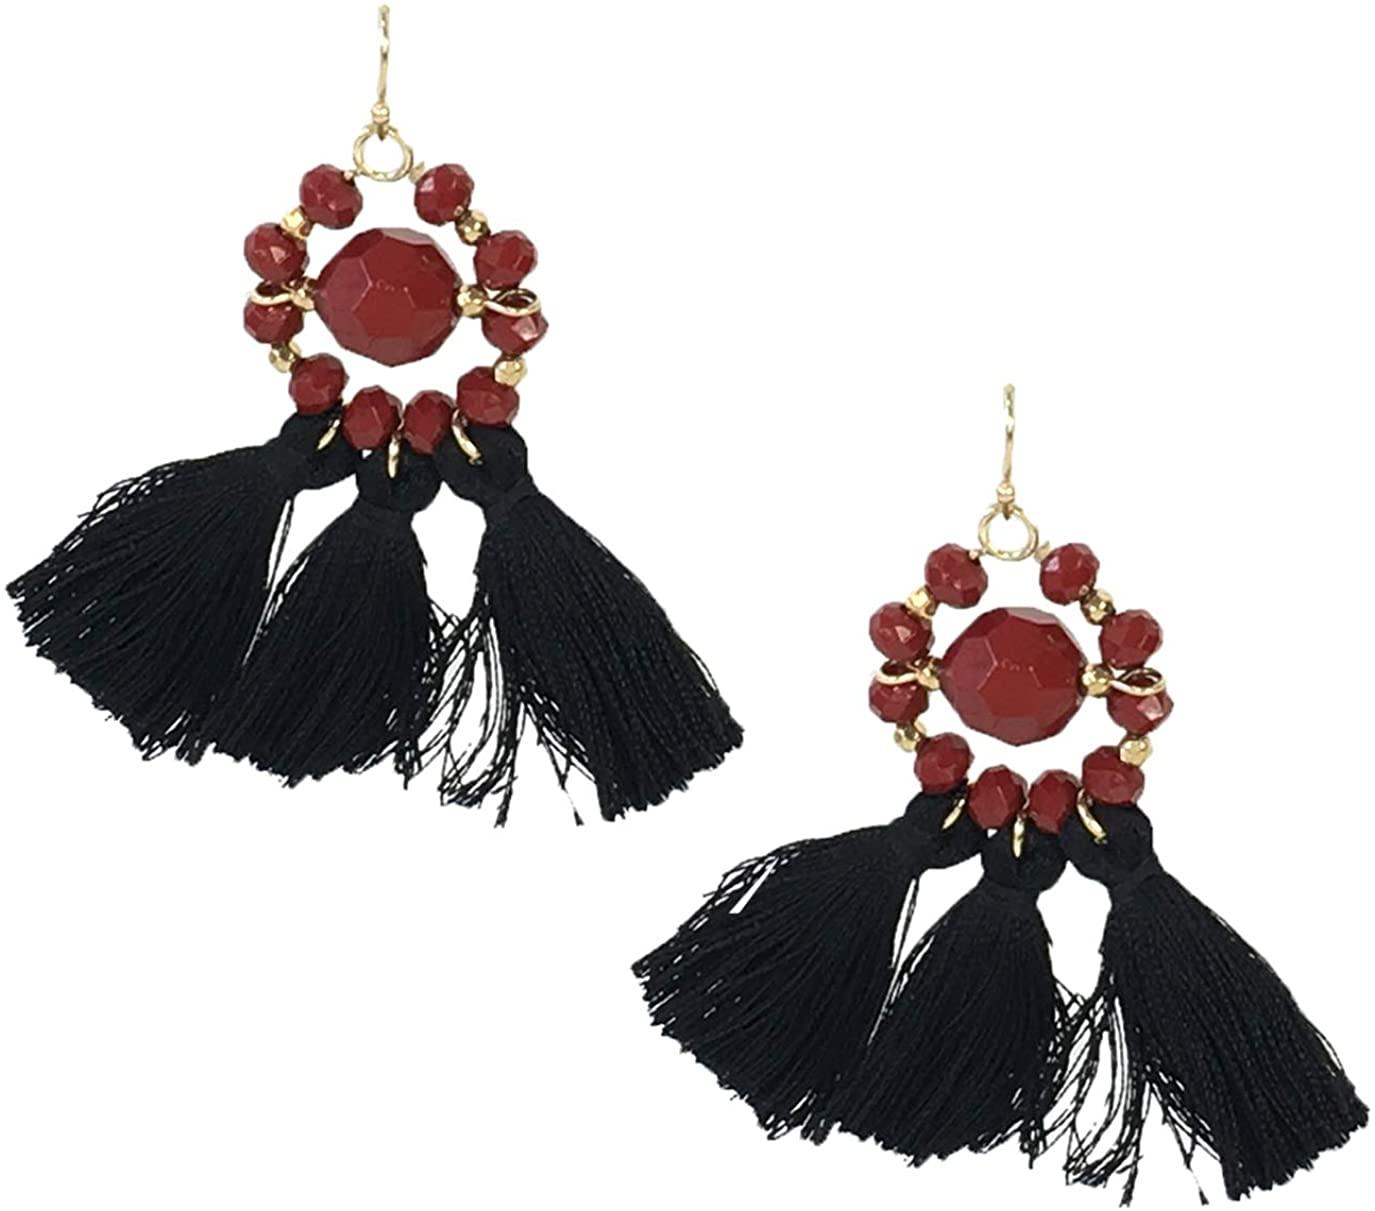 Mary Square Beaded Tassel Drop Earrings, Crimson Red/Black